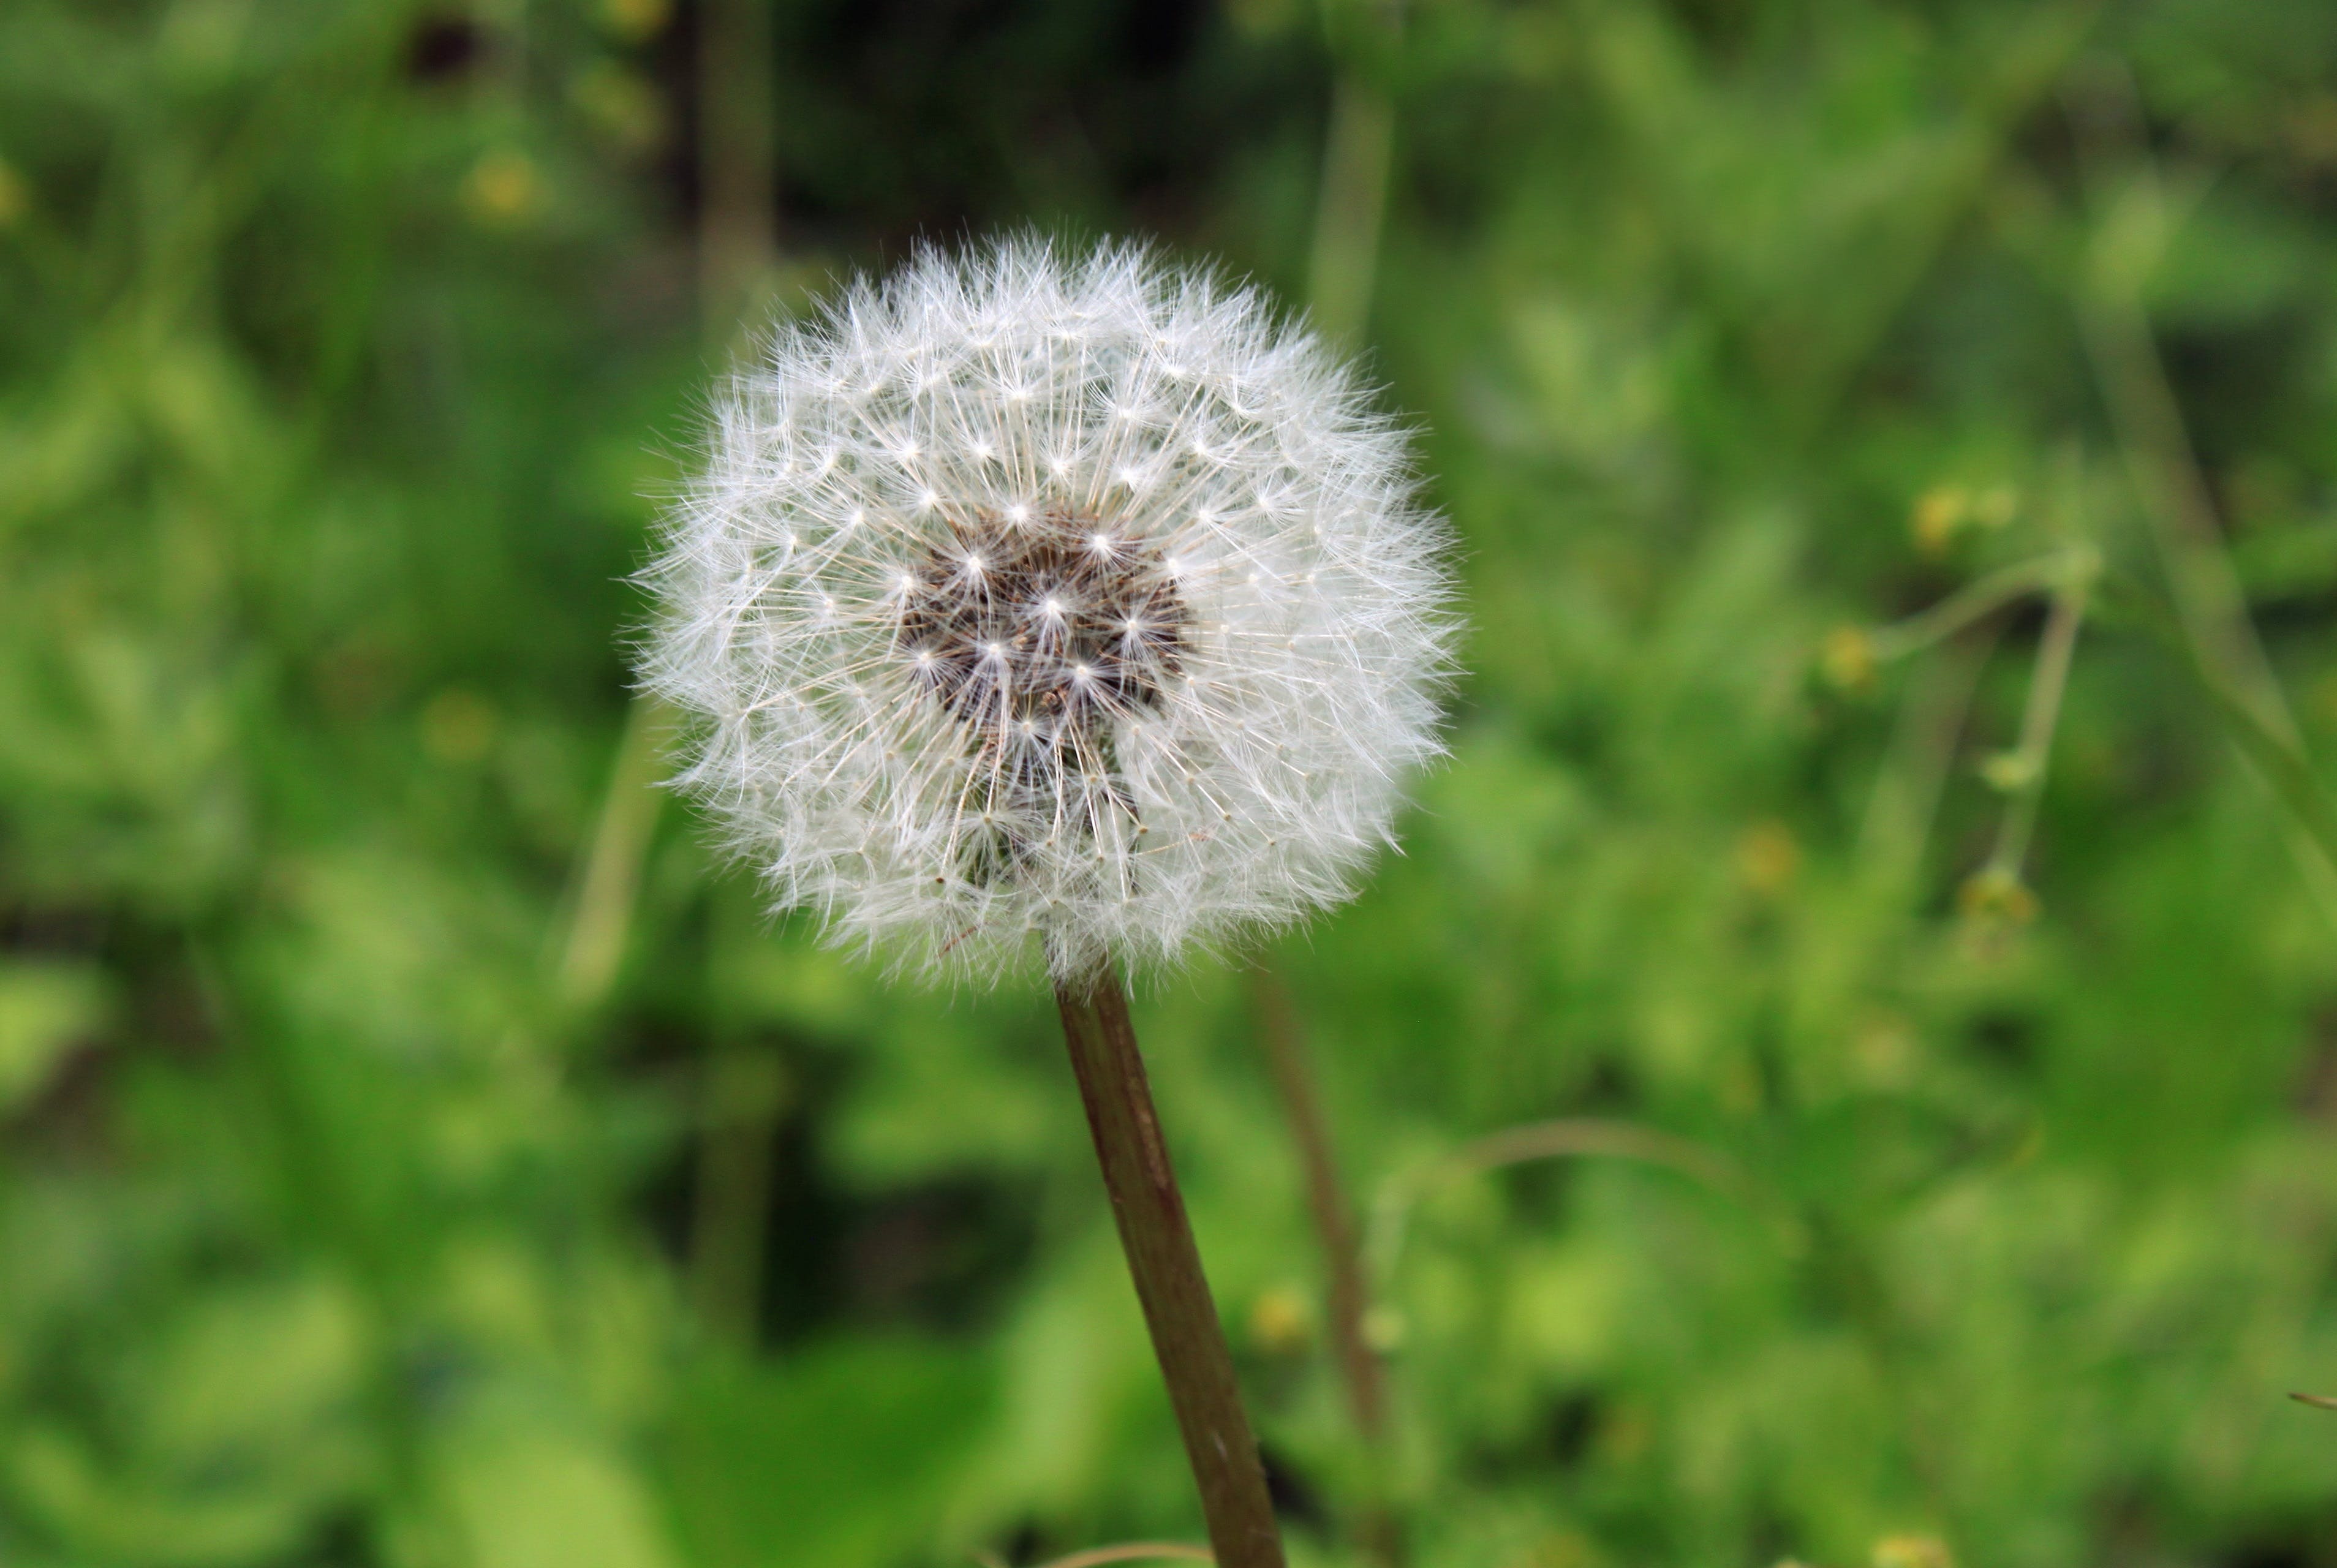 Blooming White Dandelion